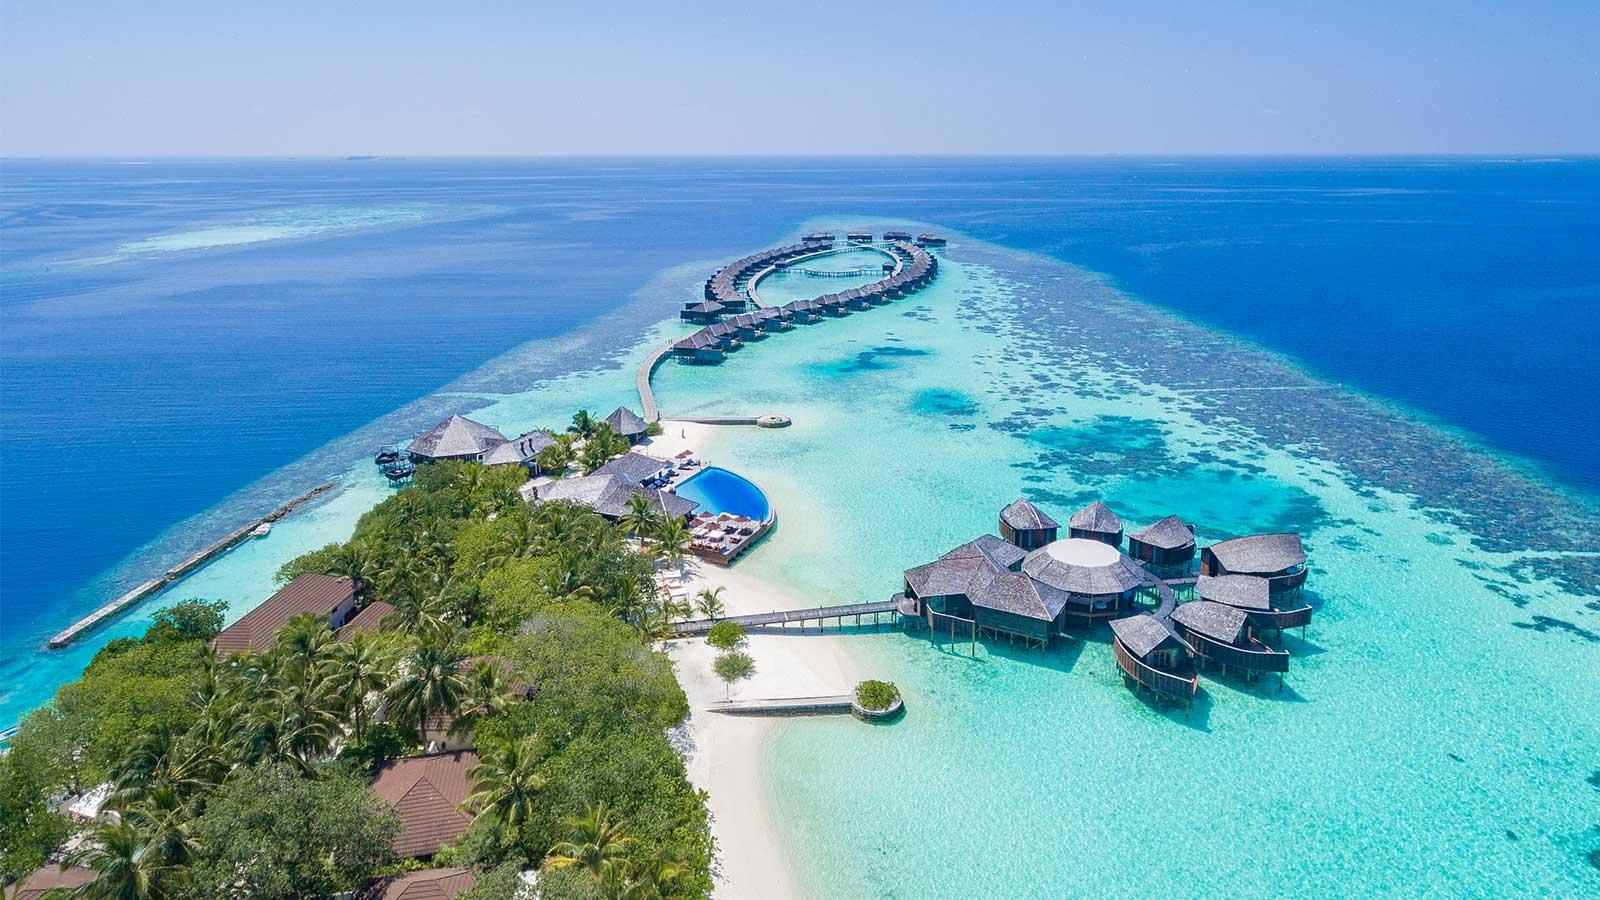 Lily Beach Resort Maldives aerial